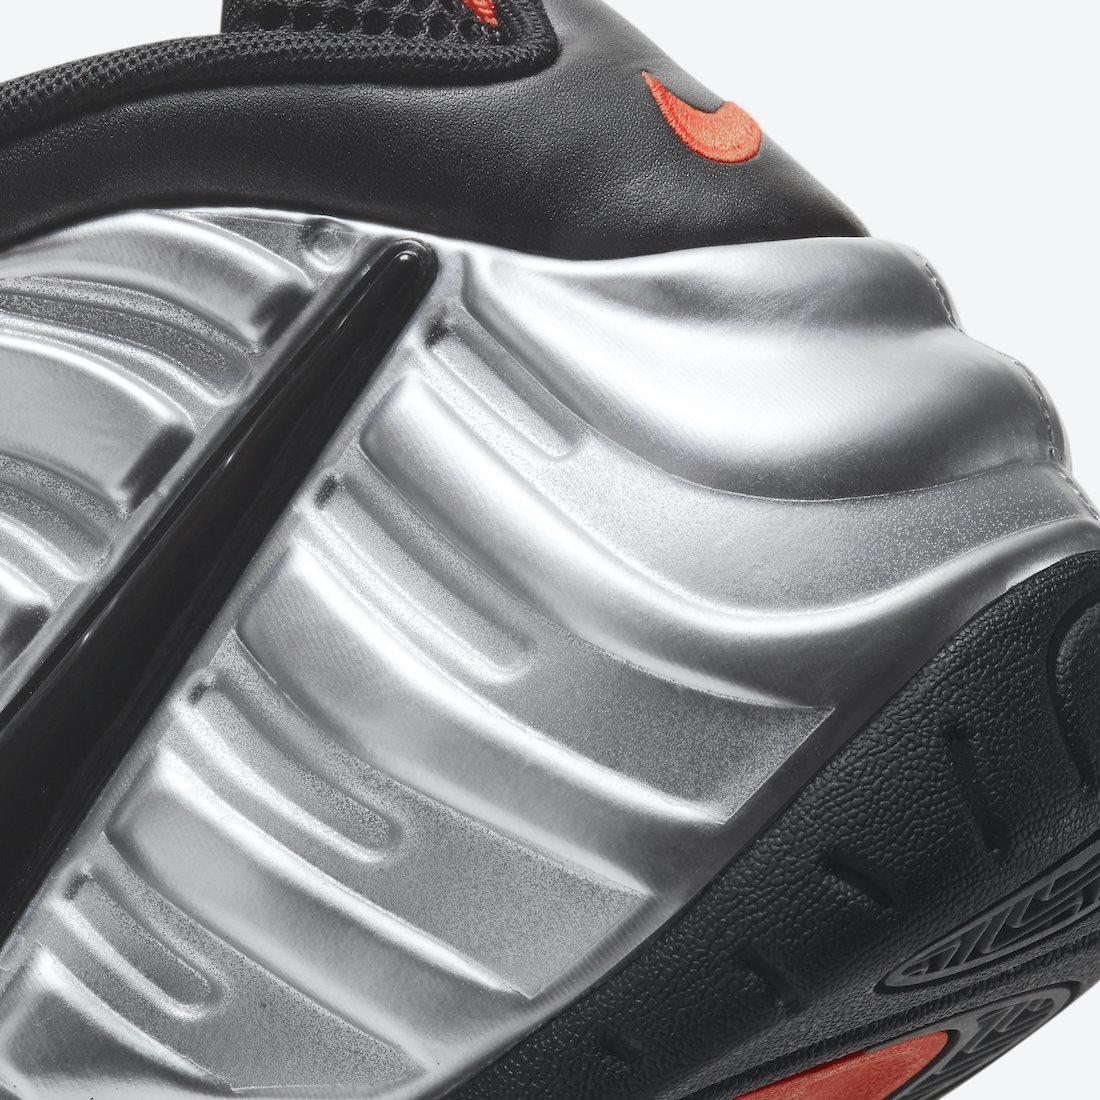 Nike-Air-Foamposite-Pro-Halloween-CT2286-001-Release-Date-Price-7